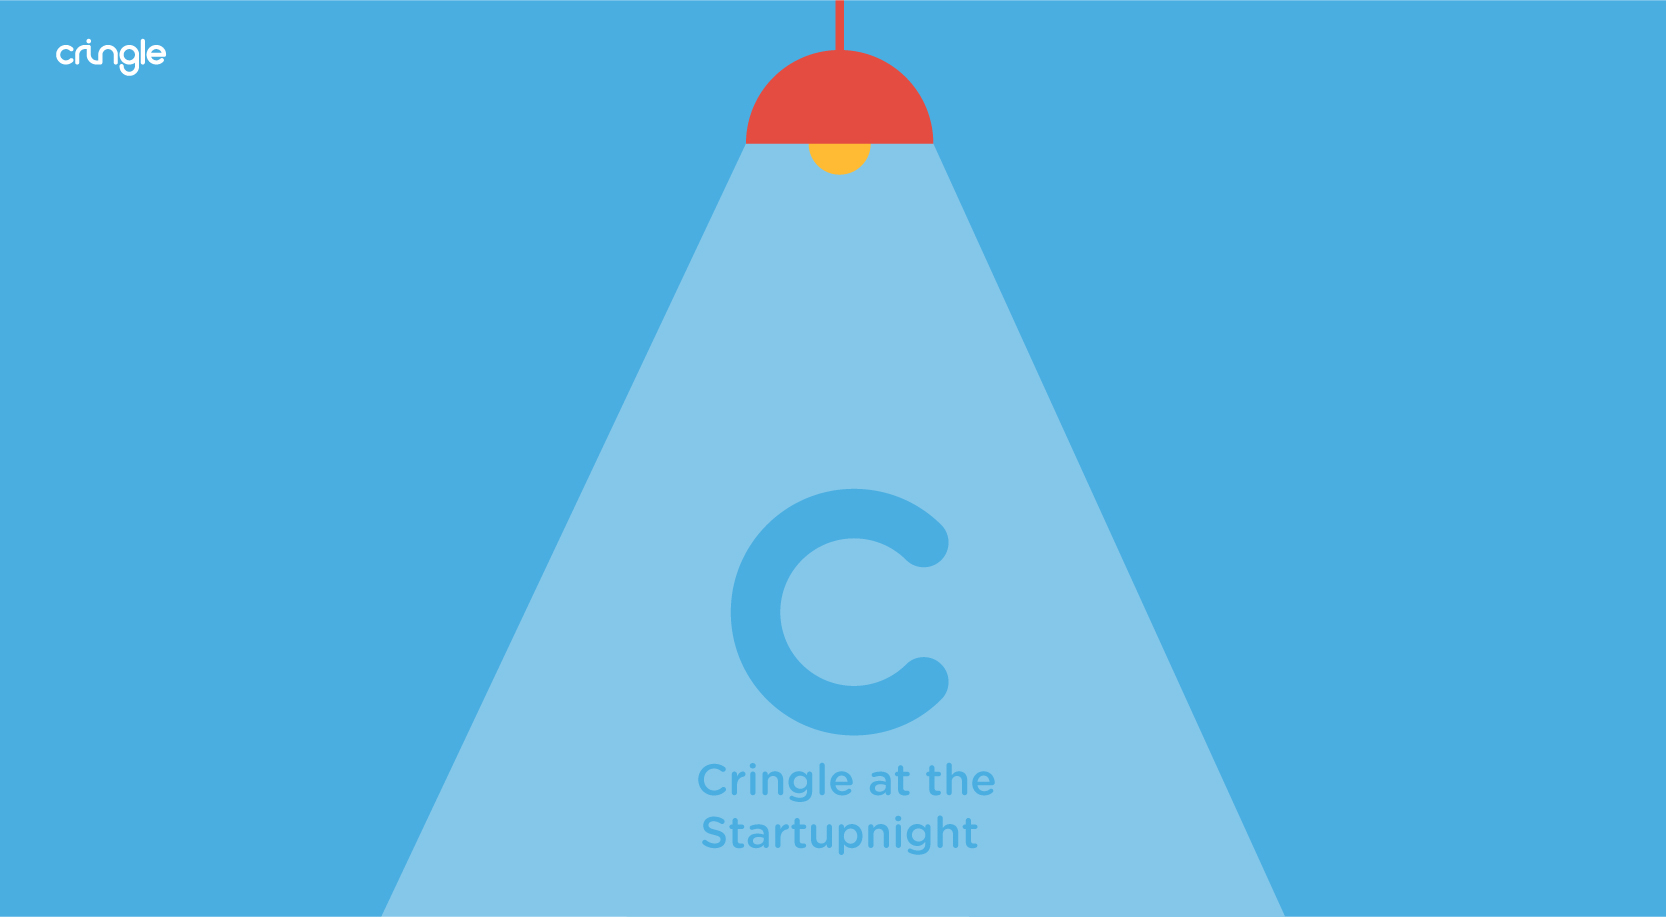 Cringle at the Startupnight